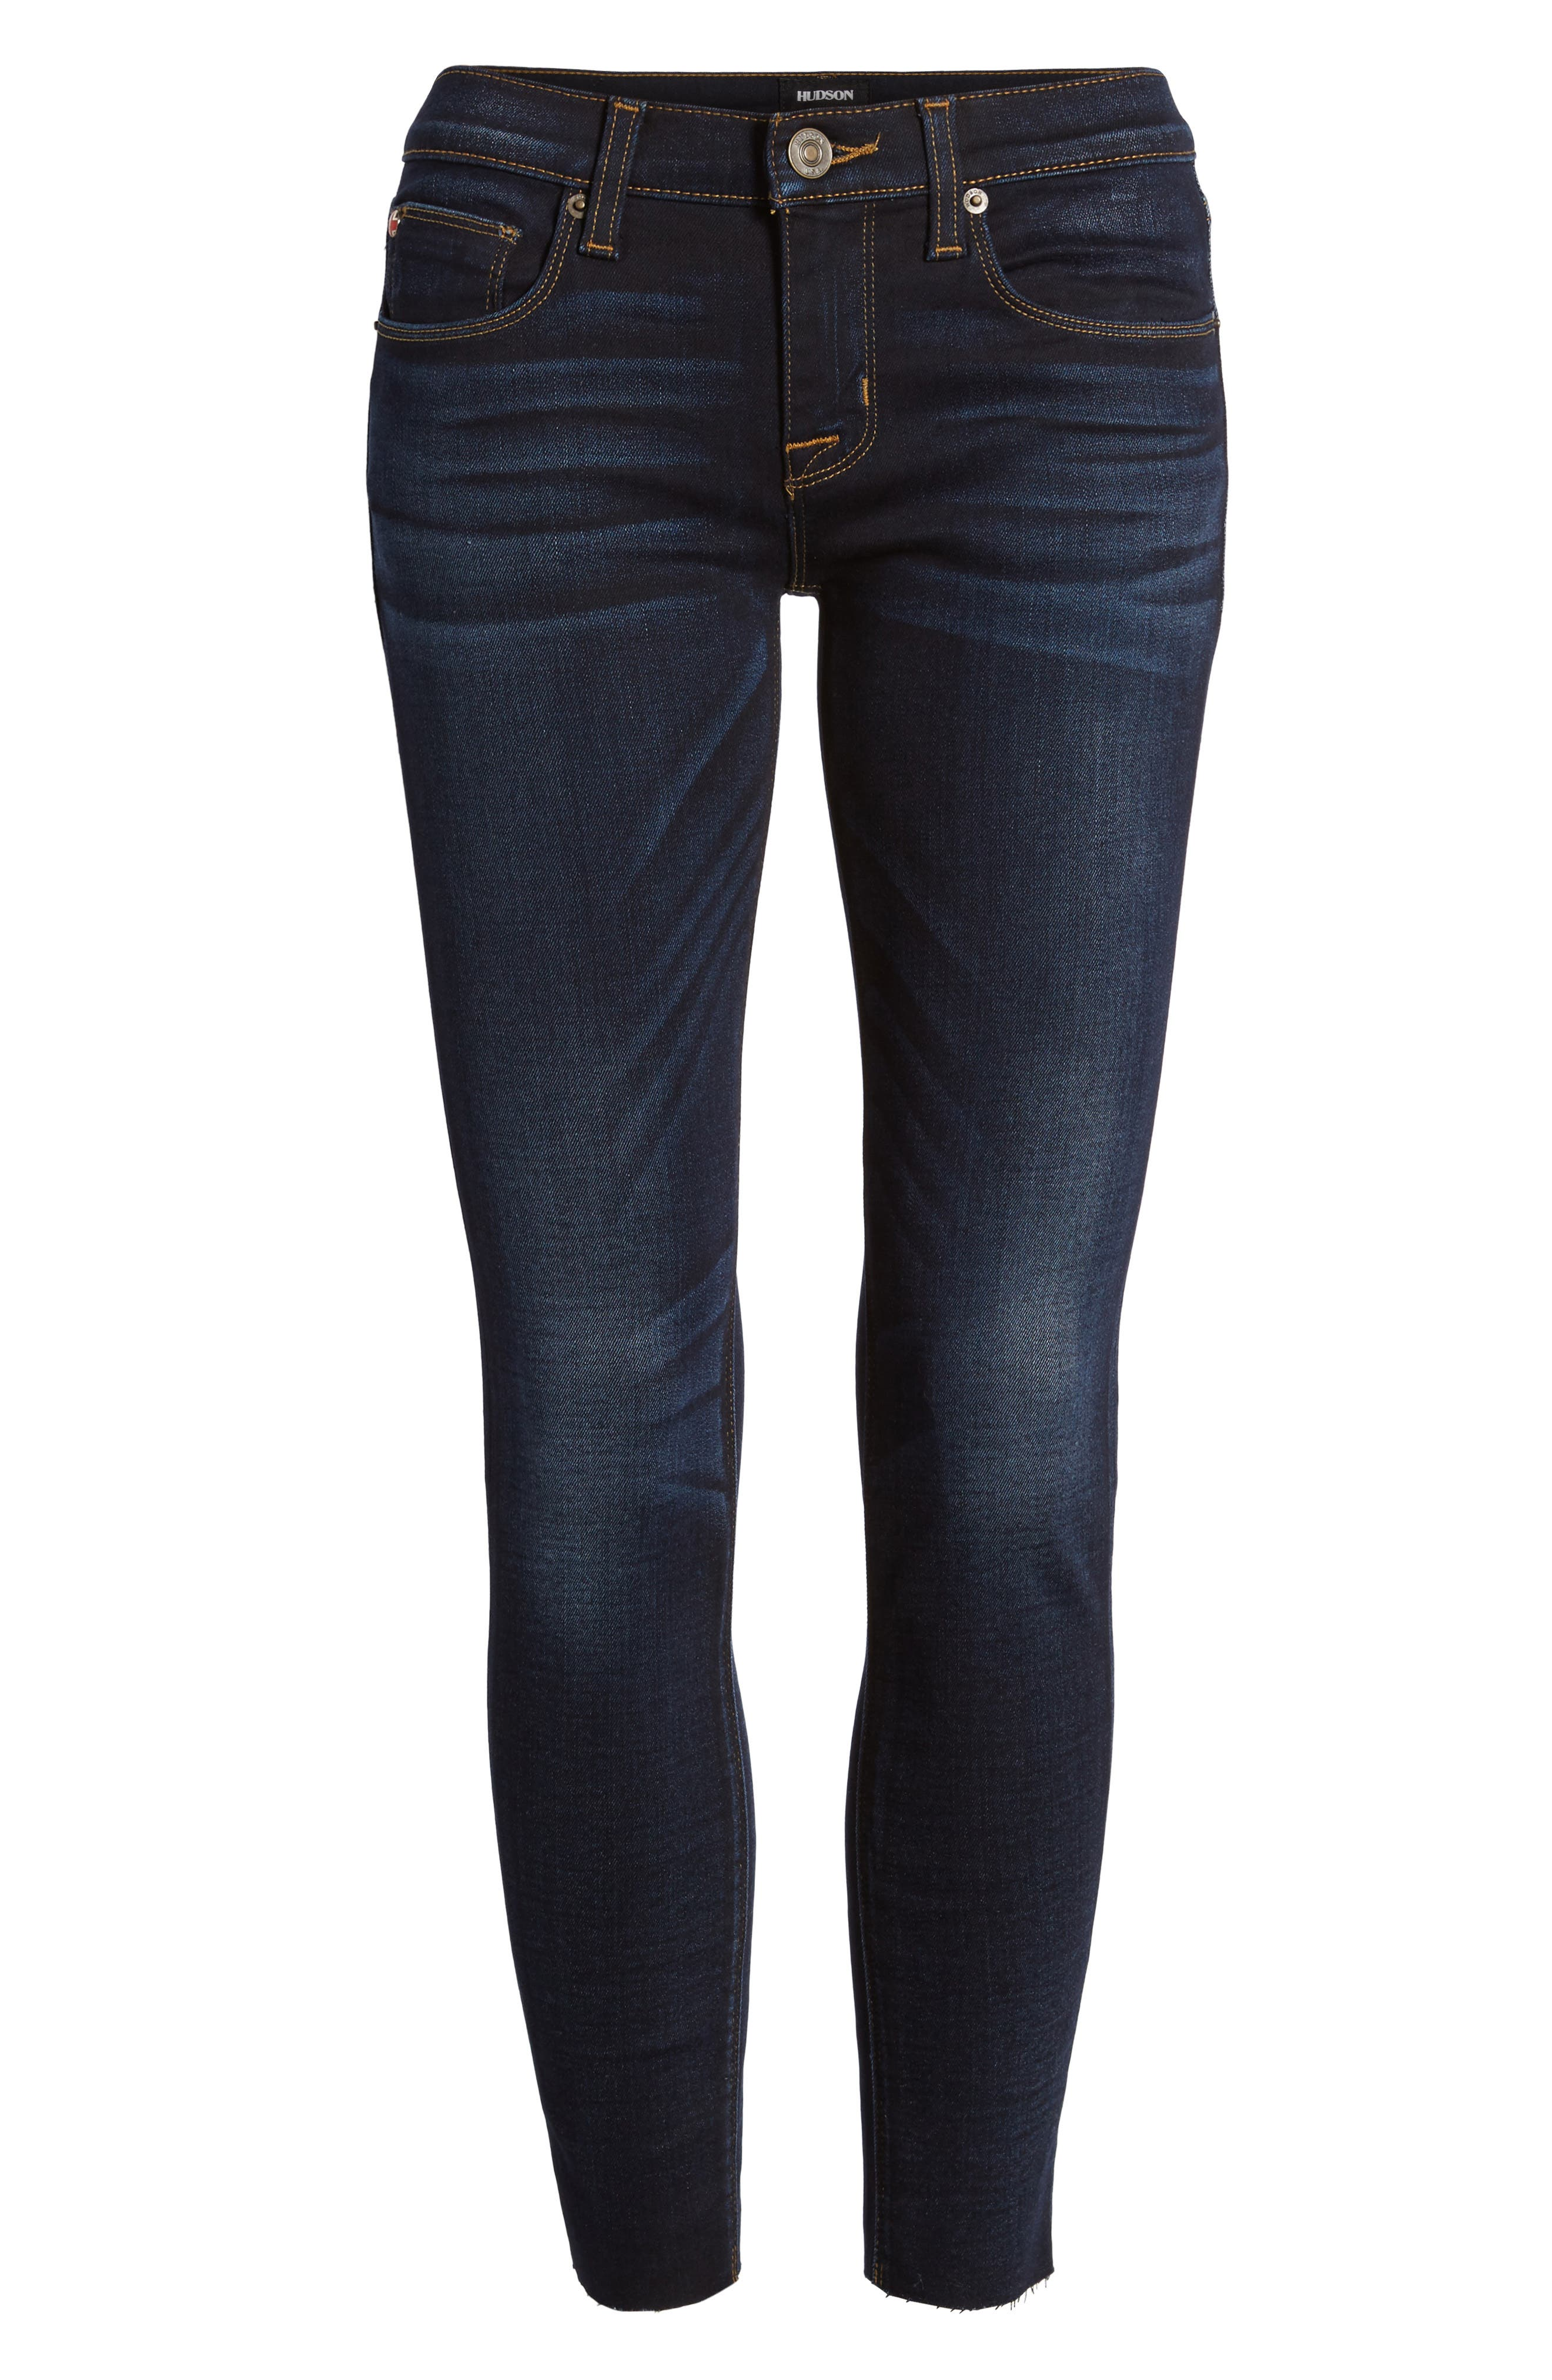 'Krista' Raw Hem Ankle Super Skinny Jeans,                             Alternate thumbnail 6, color,                             402